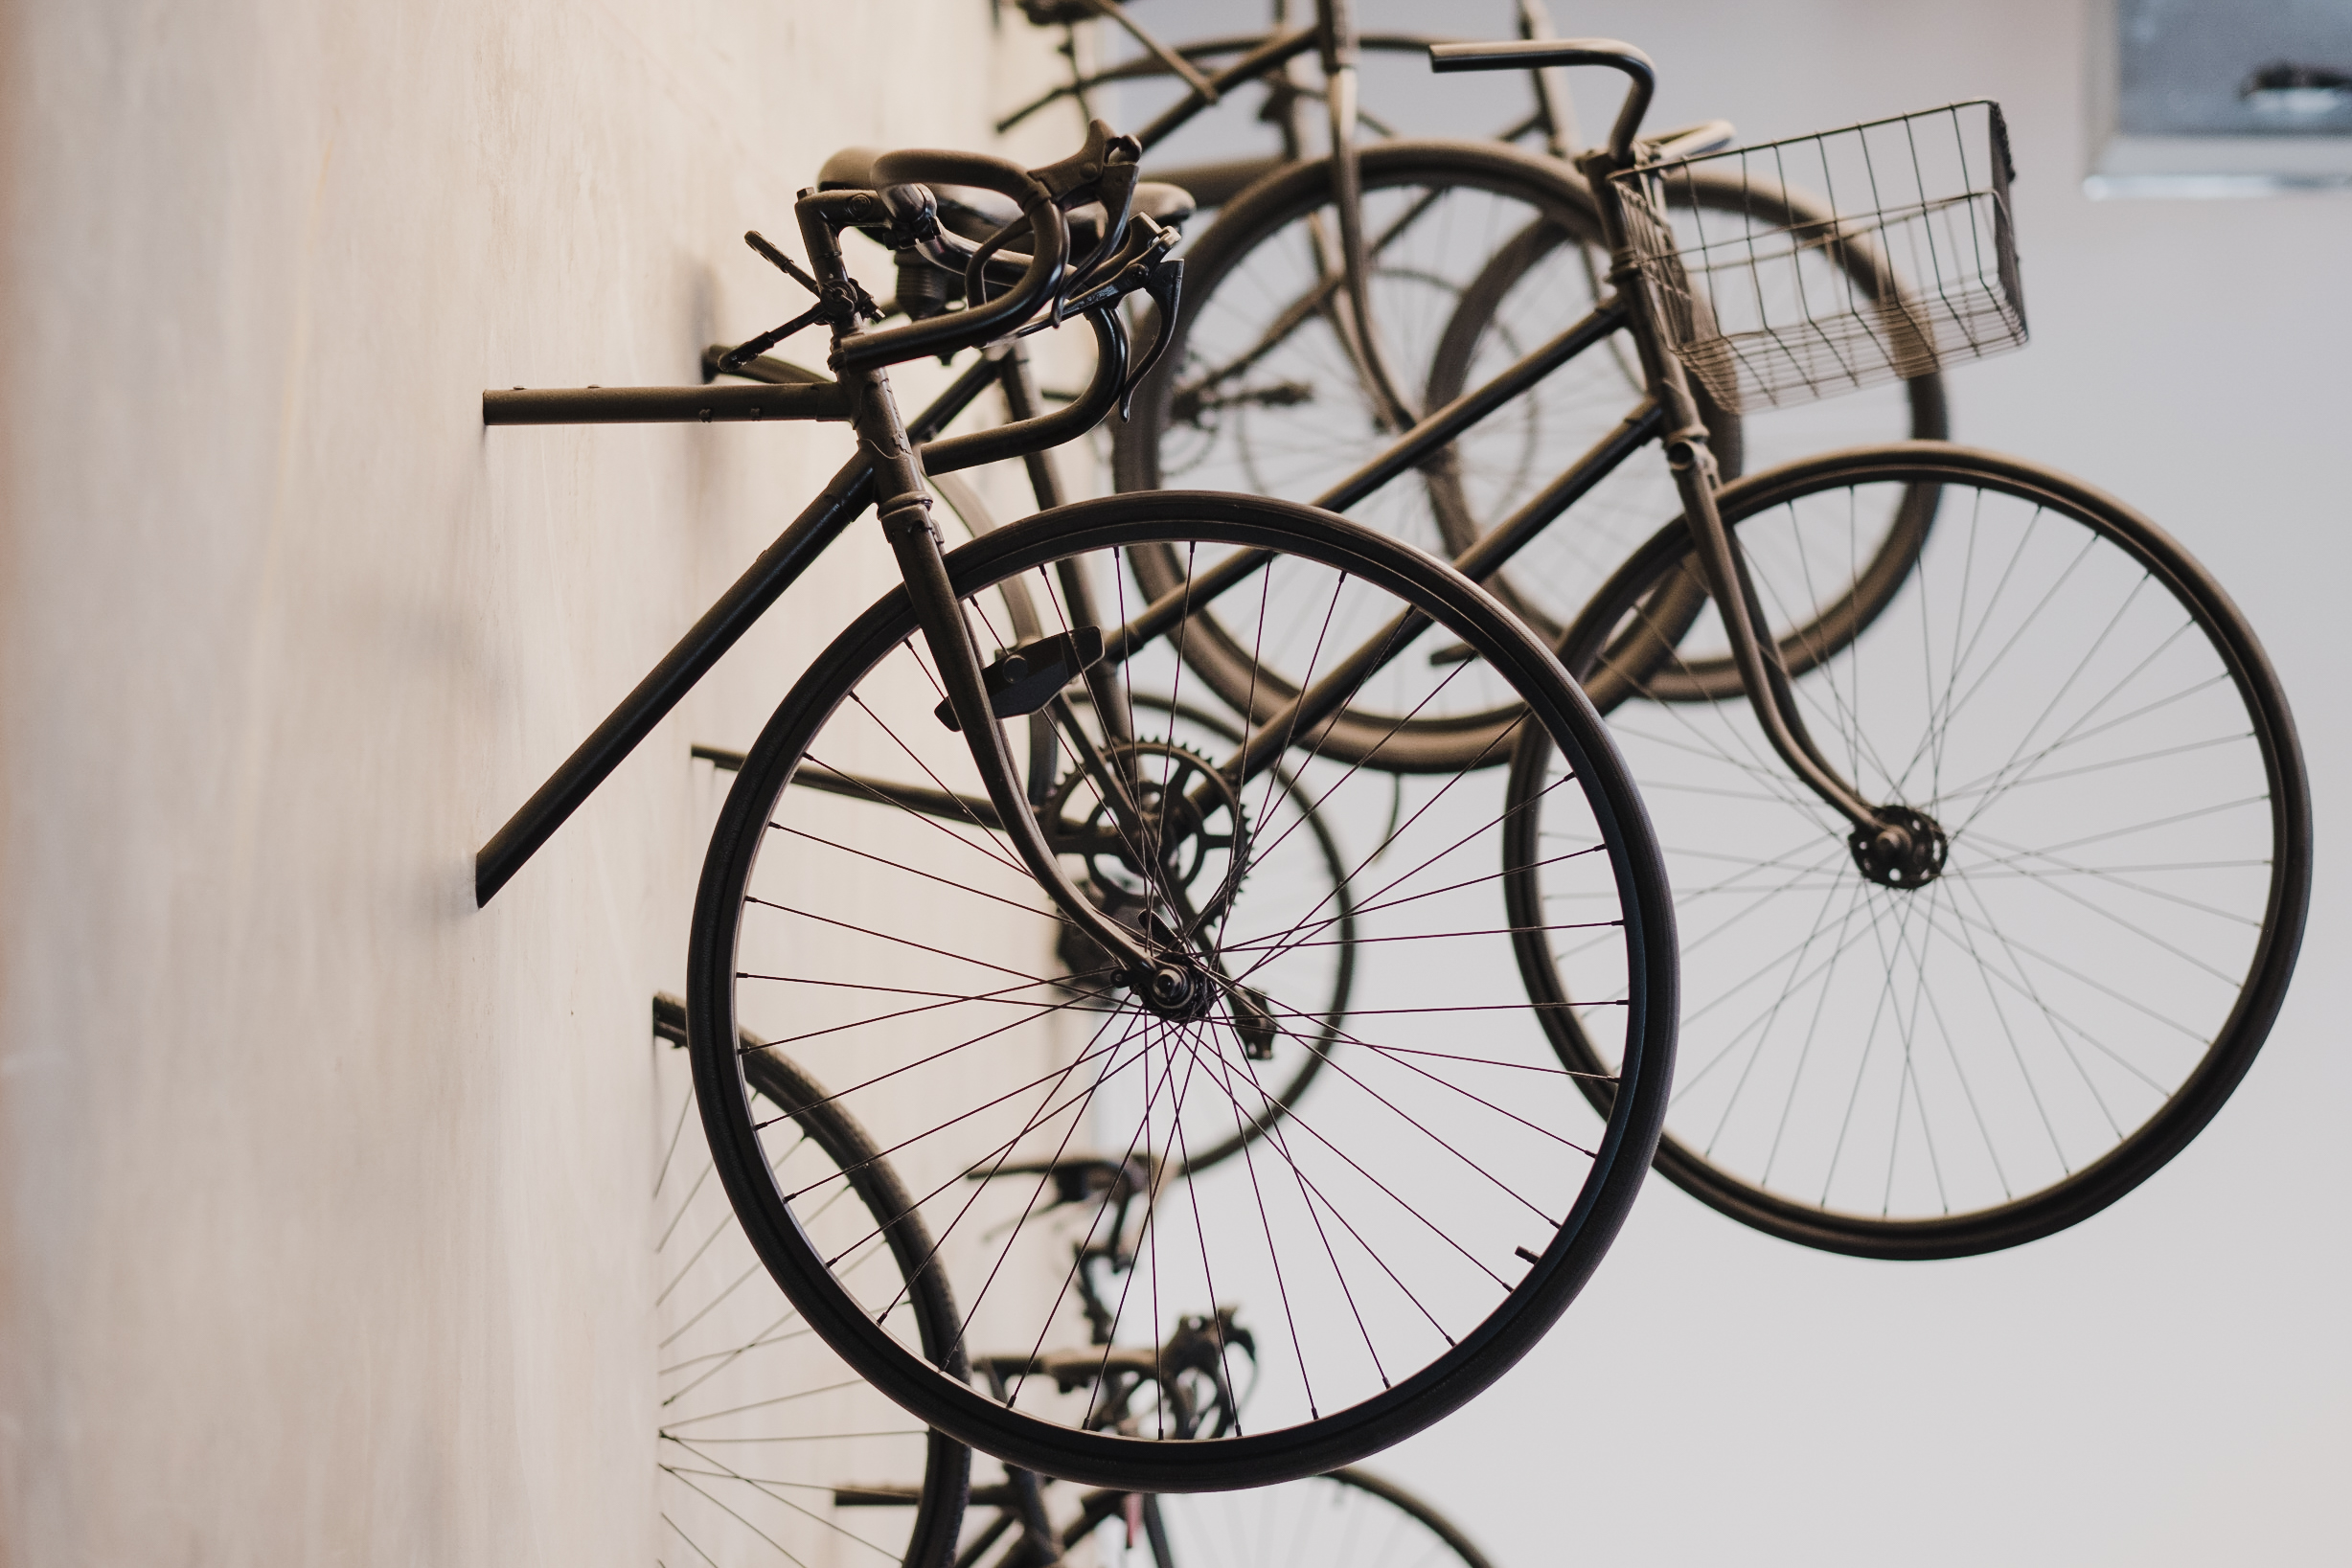 bike-cafe-LA-7967.jpg